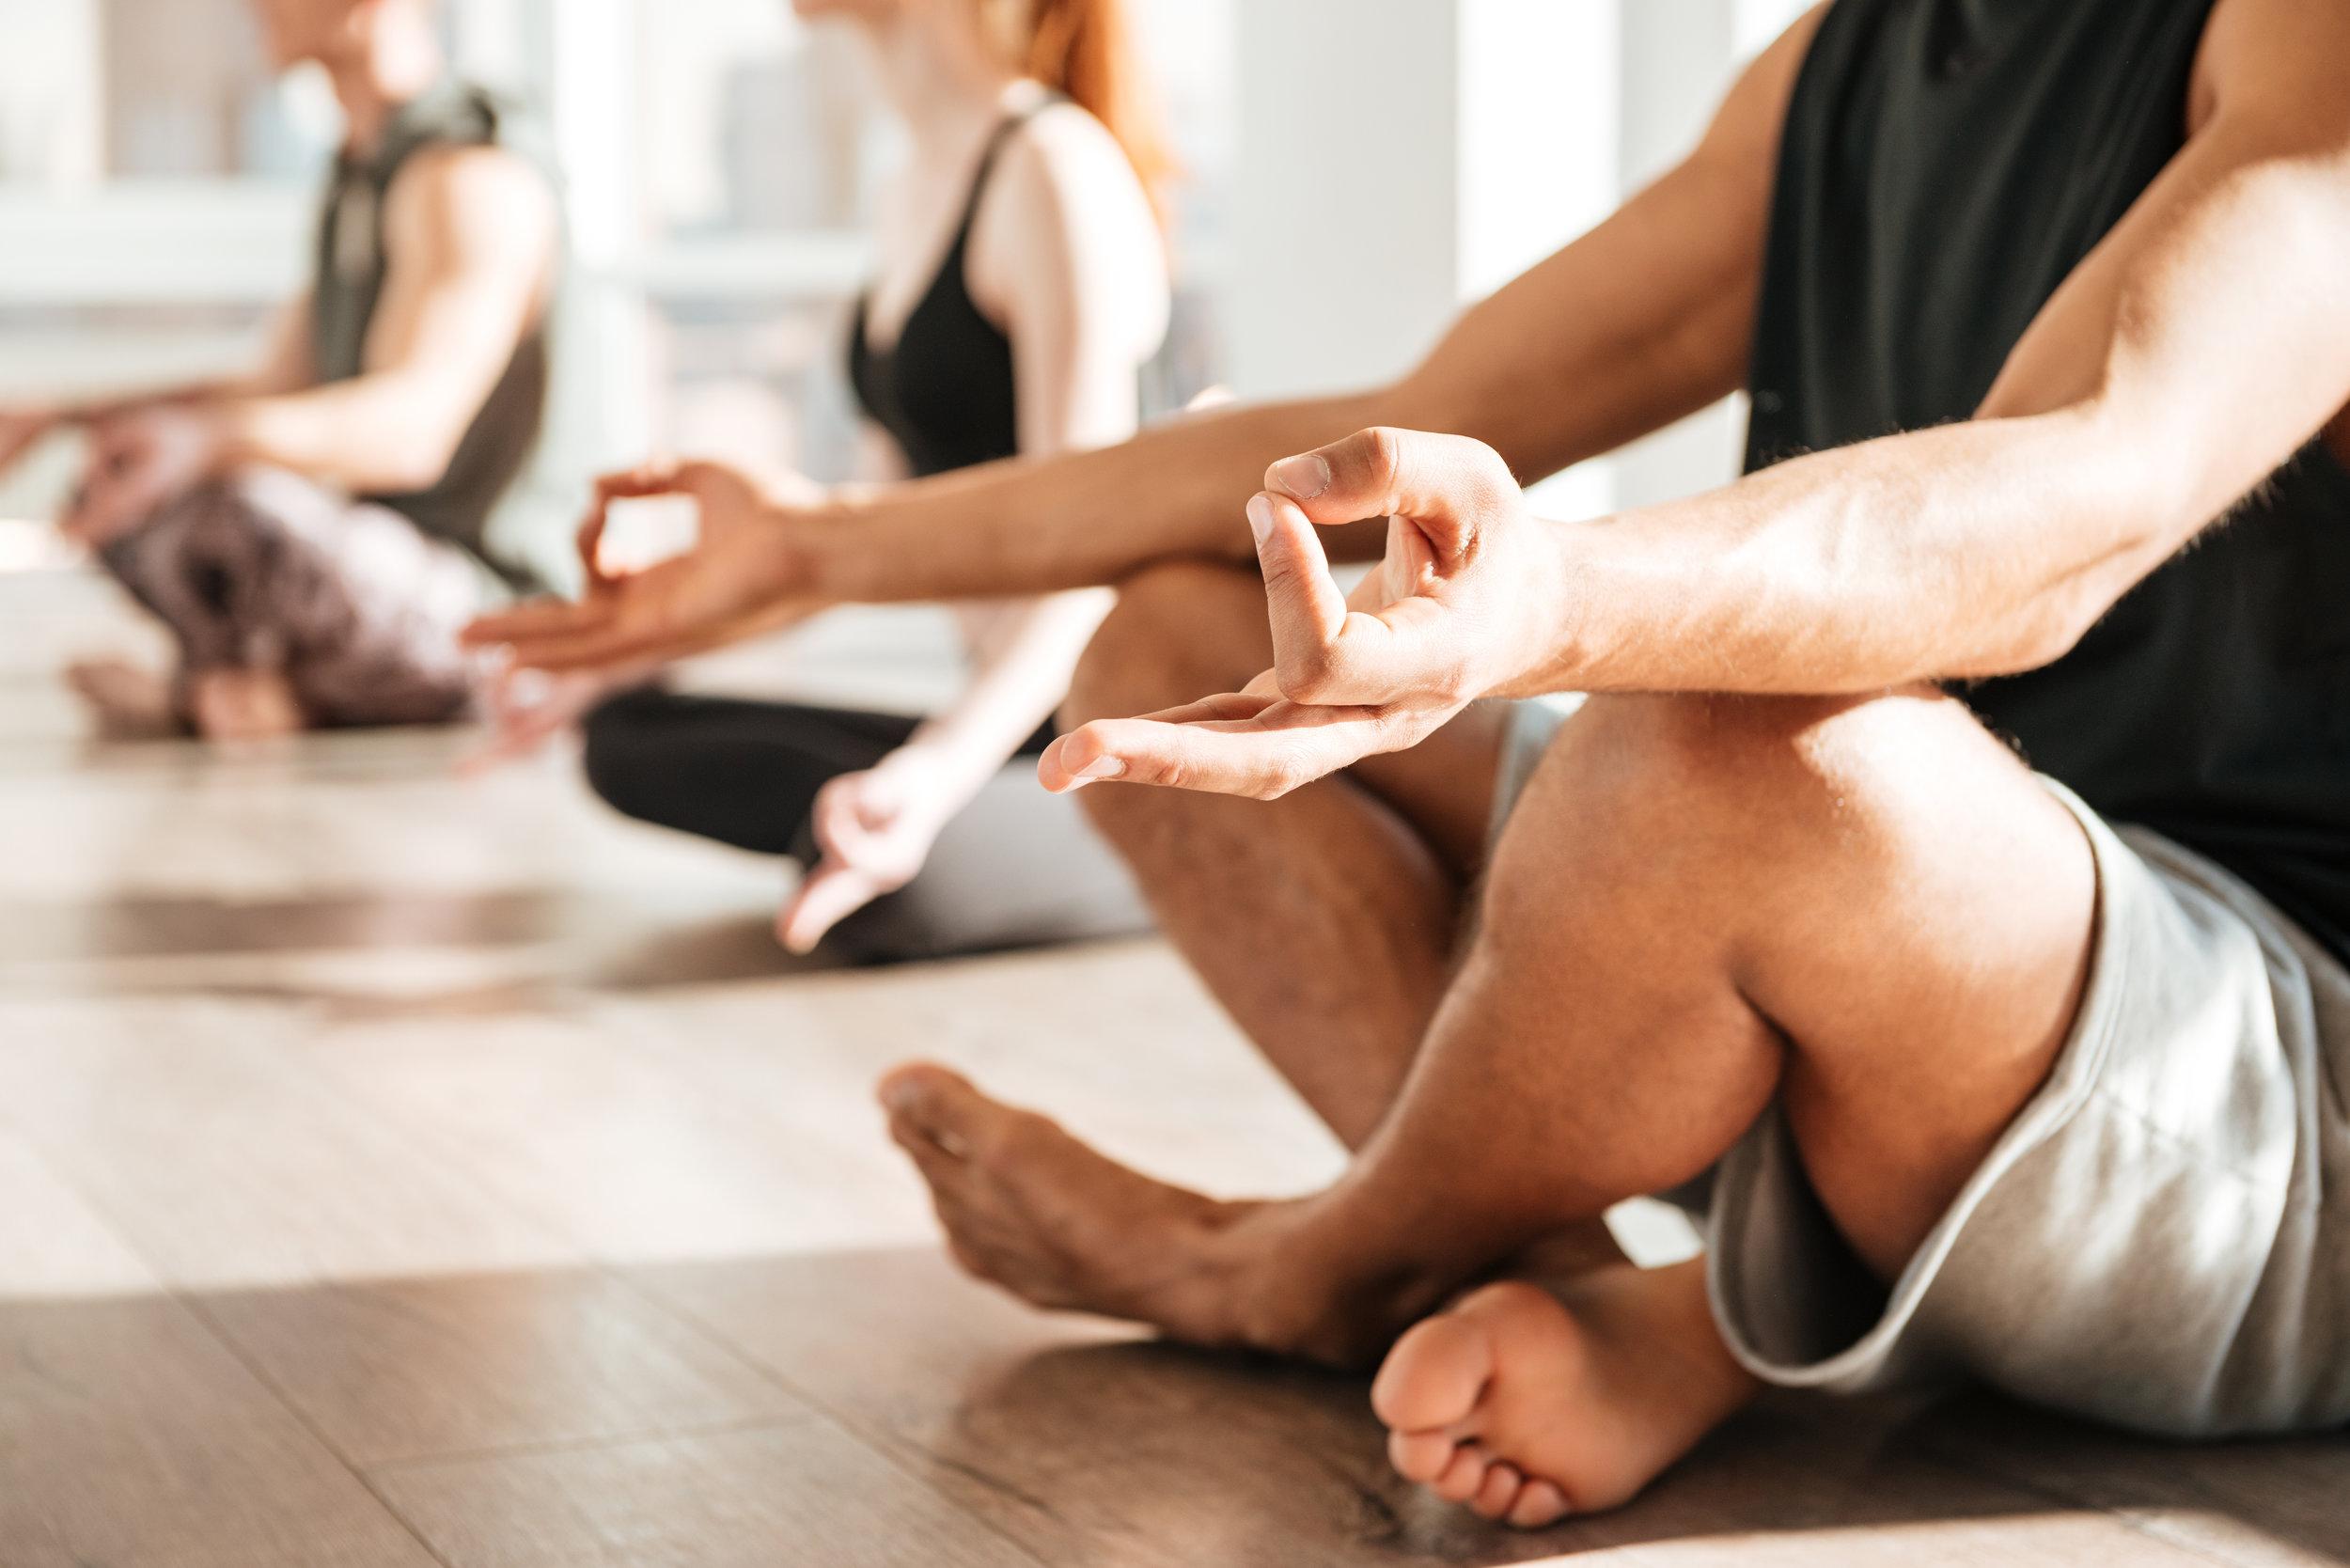 Meditation Teacher Training On-Site - 160-hour immersion program featuringDr. Deborah Norris